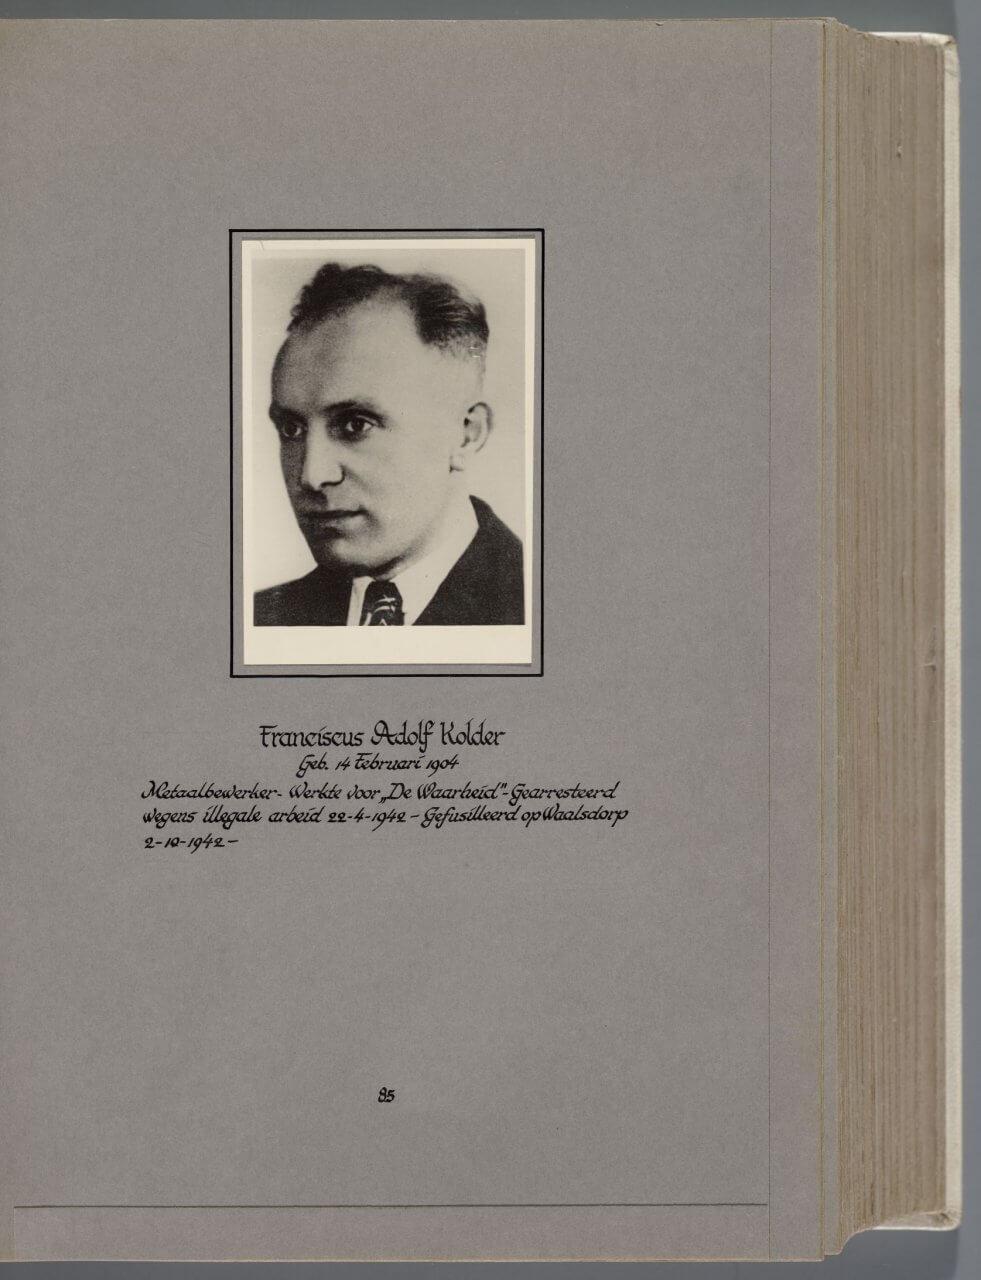 Doodenboek Fransicus Adolf Kolder oranjehotel Waalsdorpervlakte